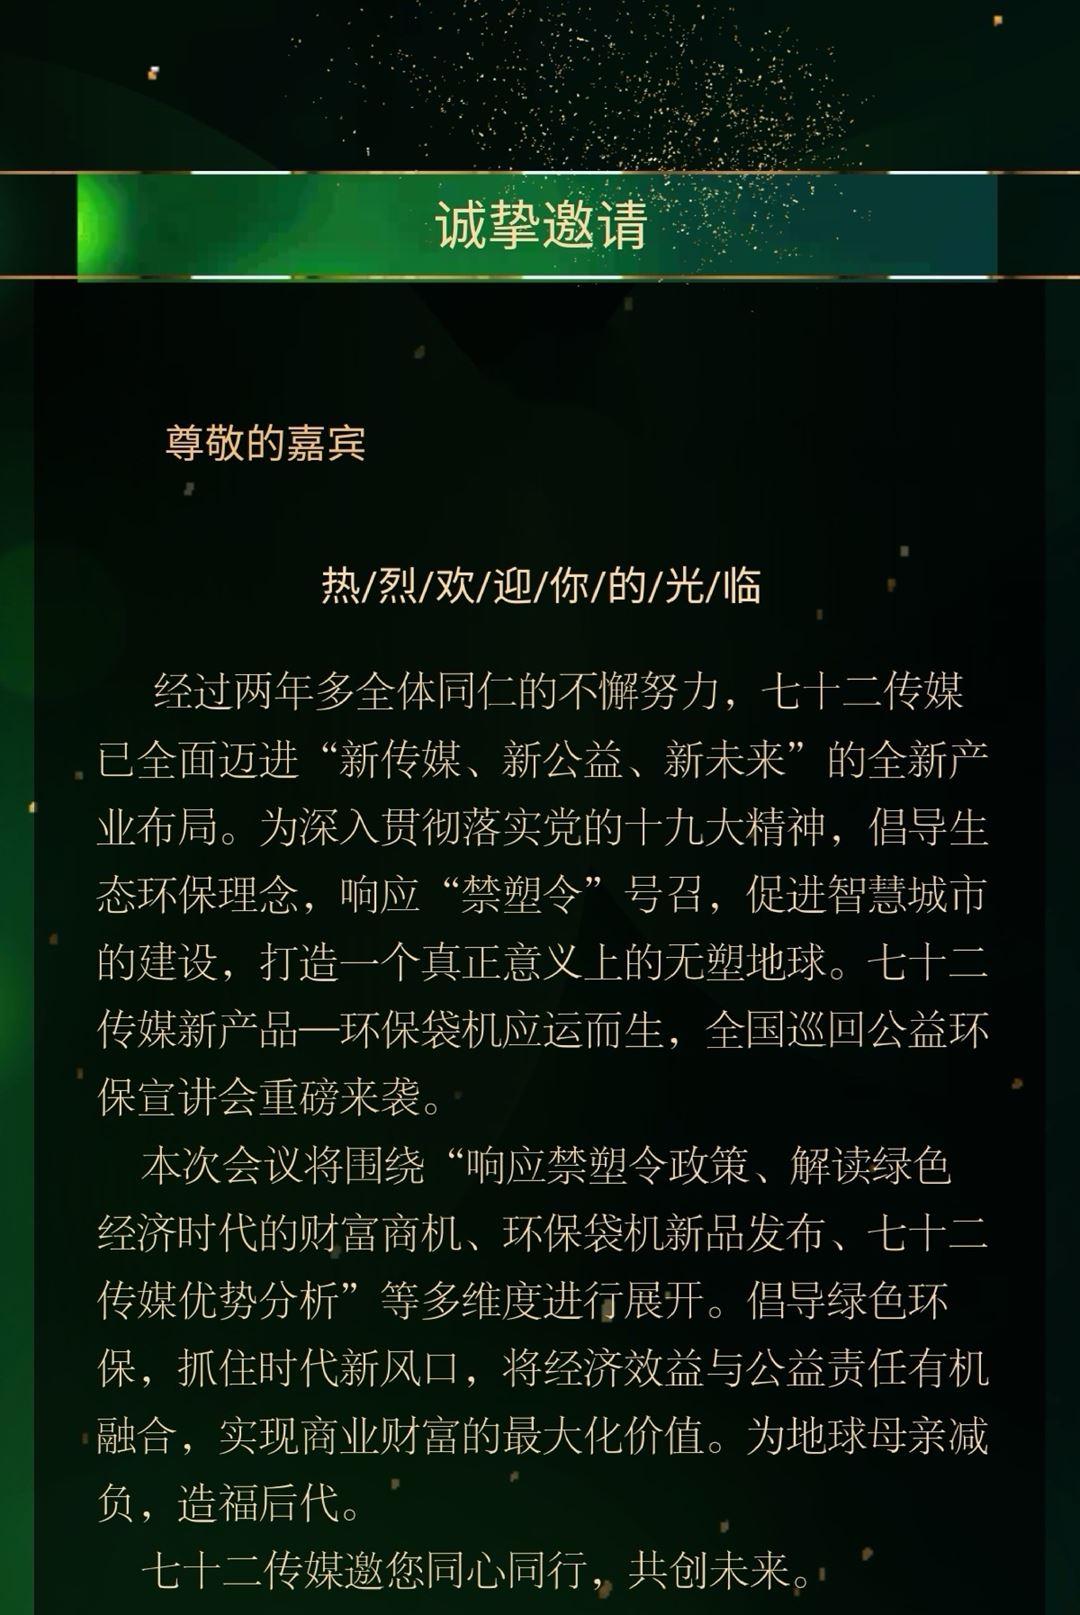 http://www.huodongxing.com/file/20180527/5423068656966/884214892776374.jpg